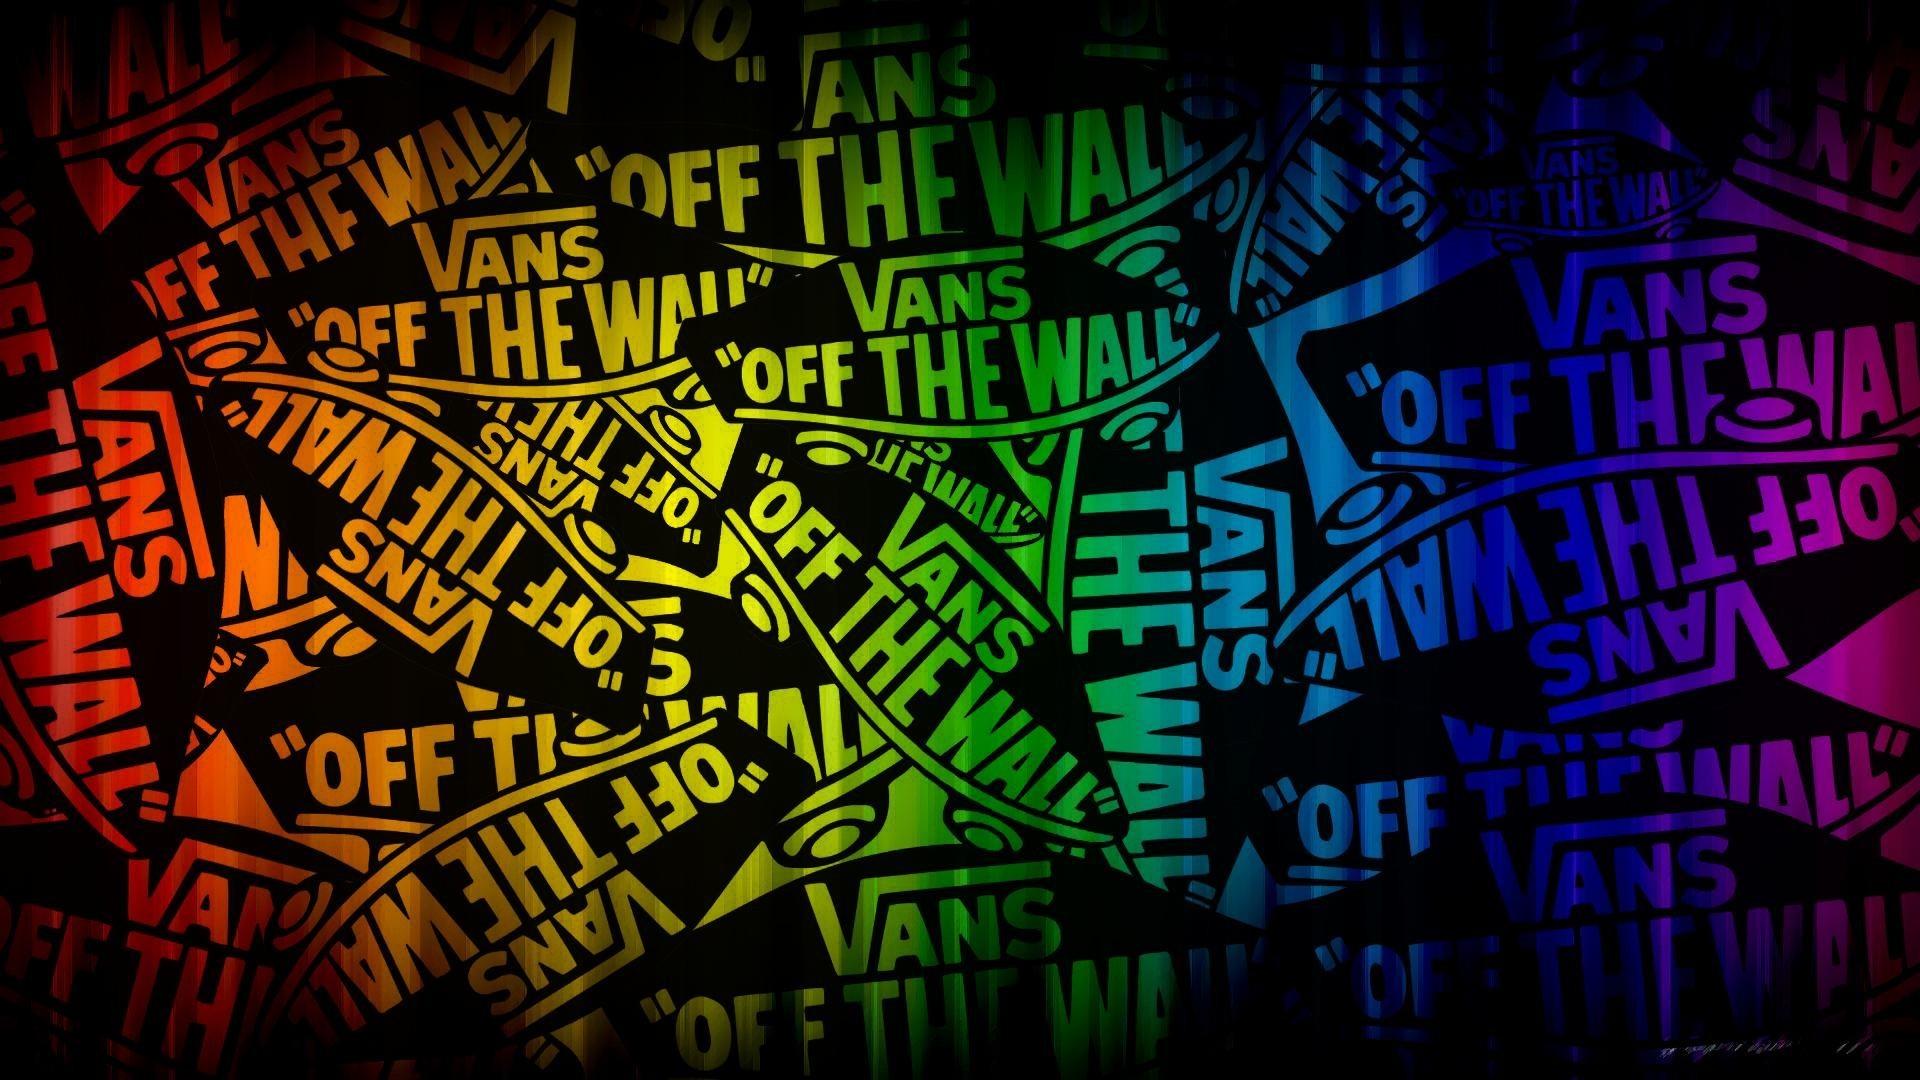 Primitive Skate Wallpaper Hd 183 ① Wallpapertag